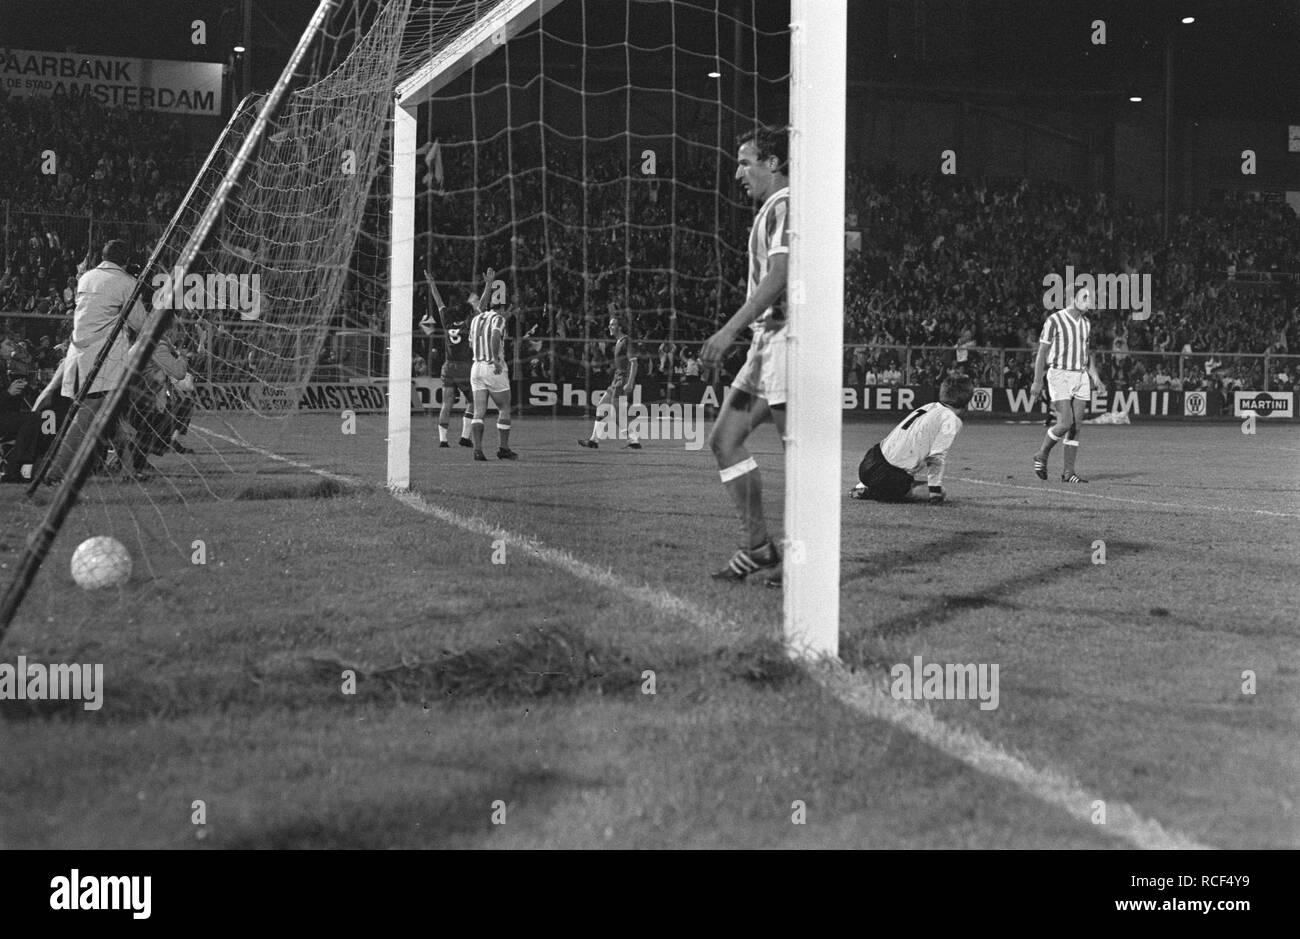 Ajax tegen Menduri Tirana 2-0, Europa Cup I, Bestanddeelnr 923-8897. - Stock Image